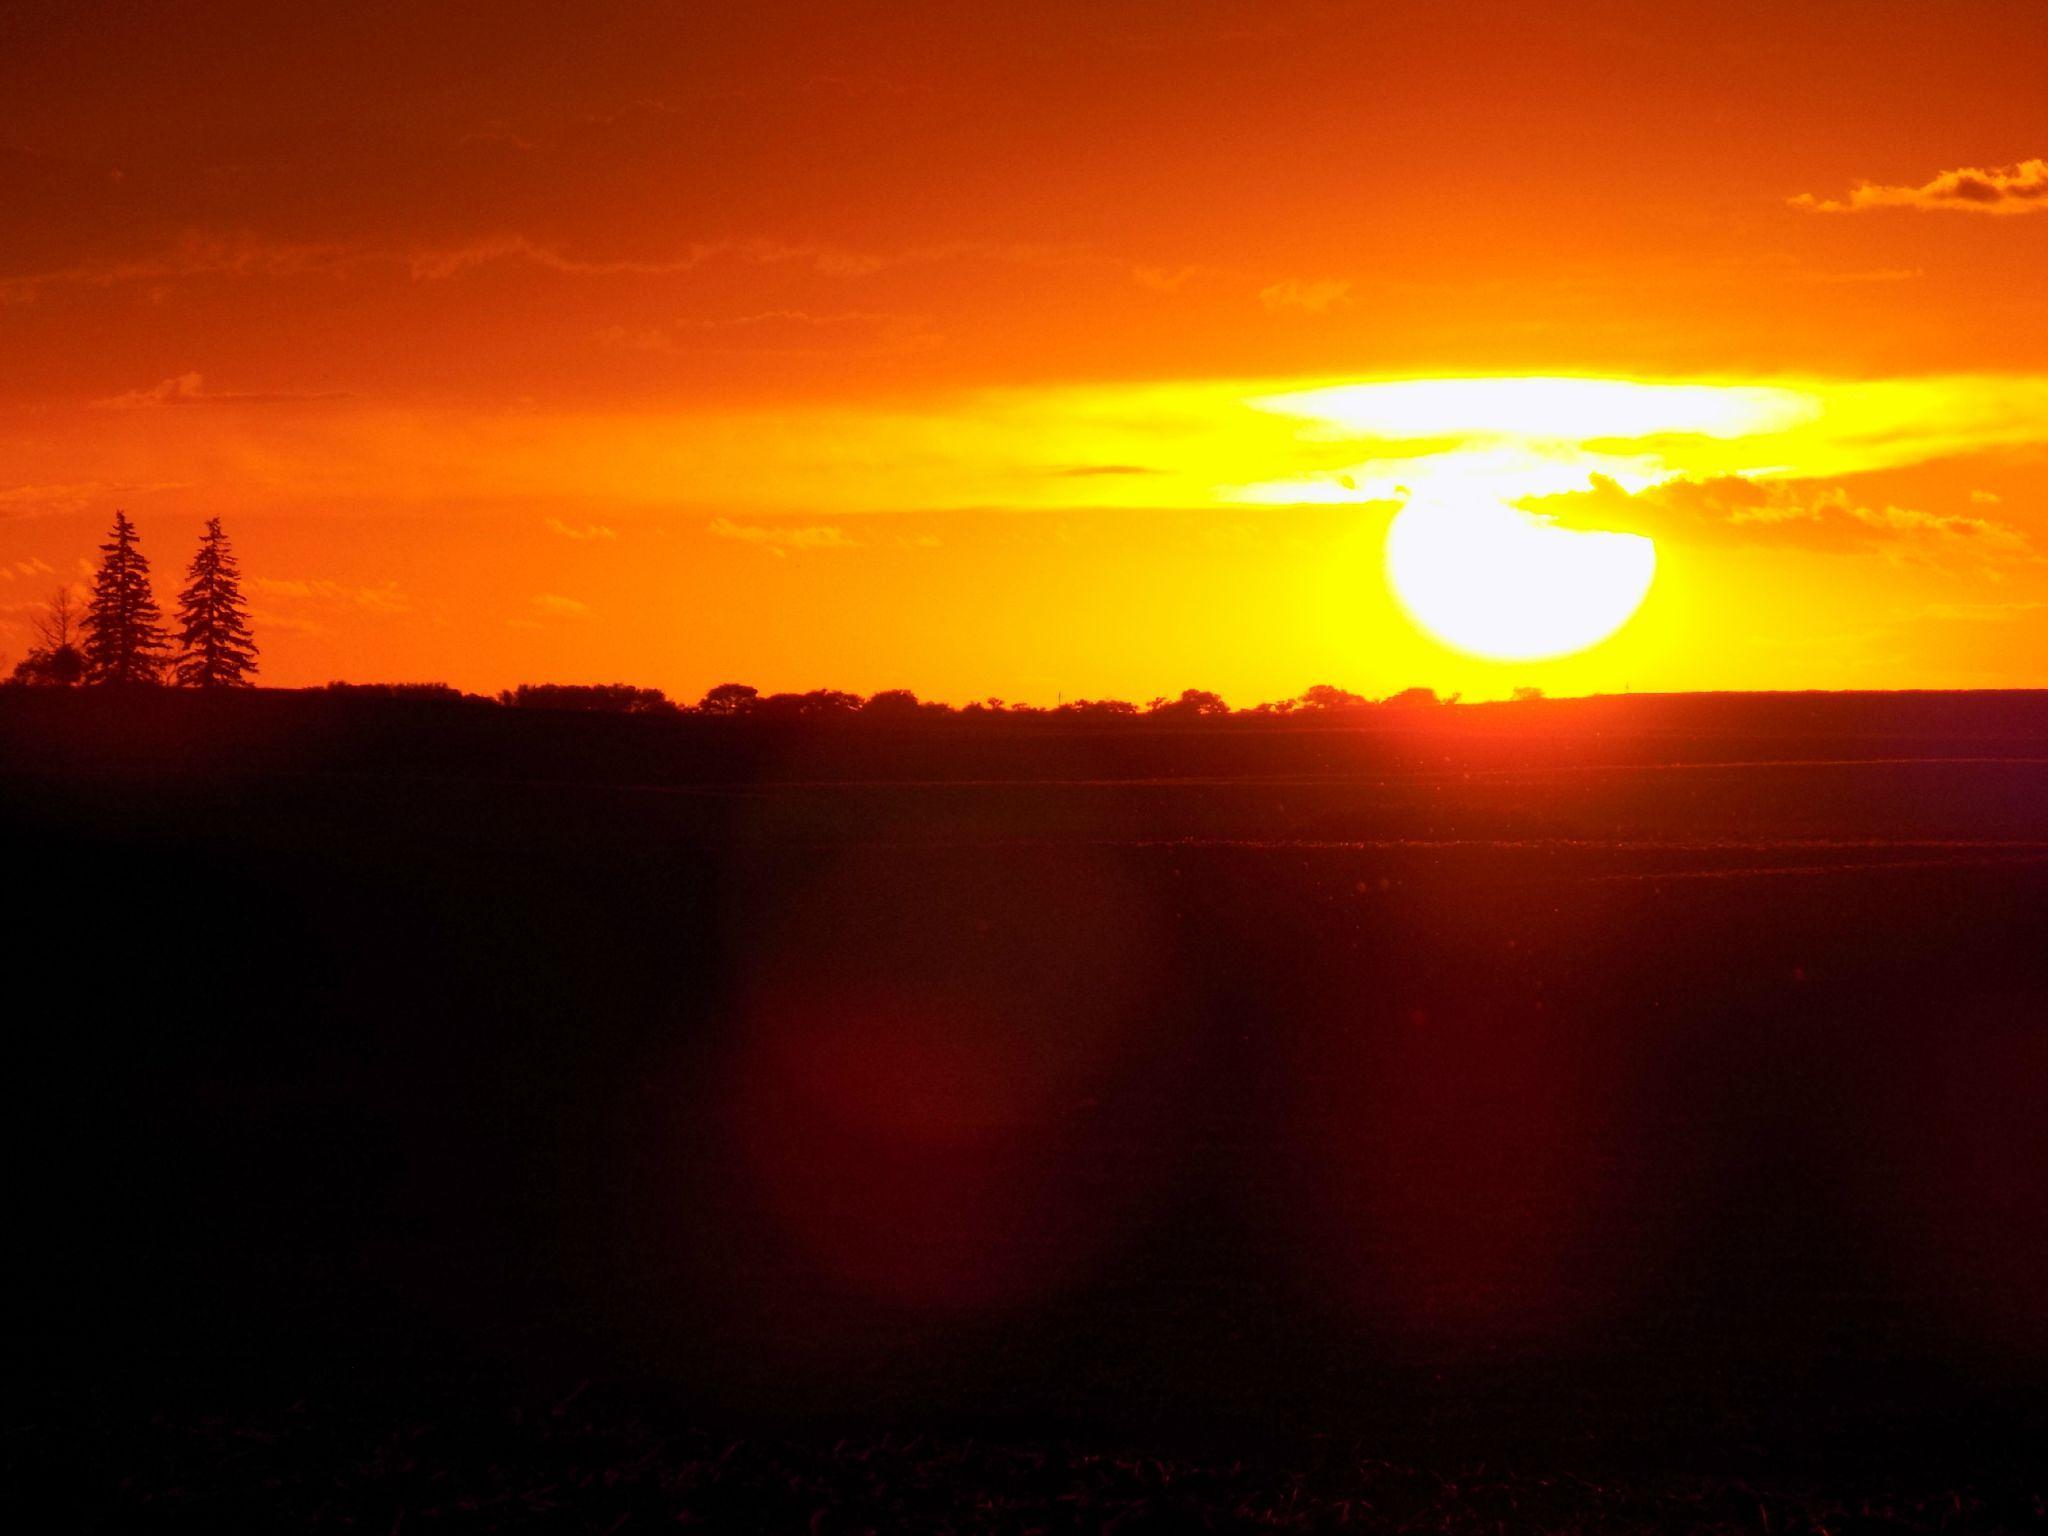 Sunset on the Prairie by Anita Roberts Soupir